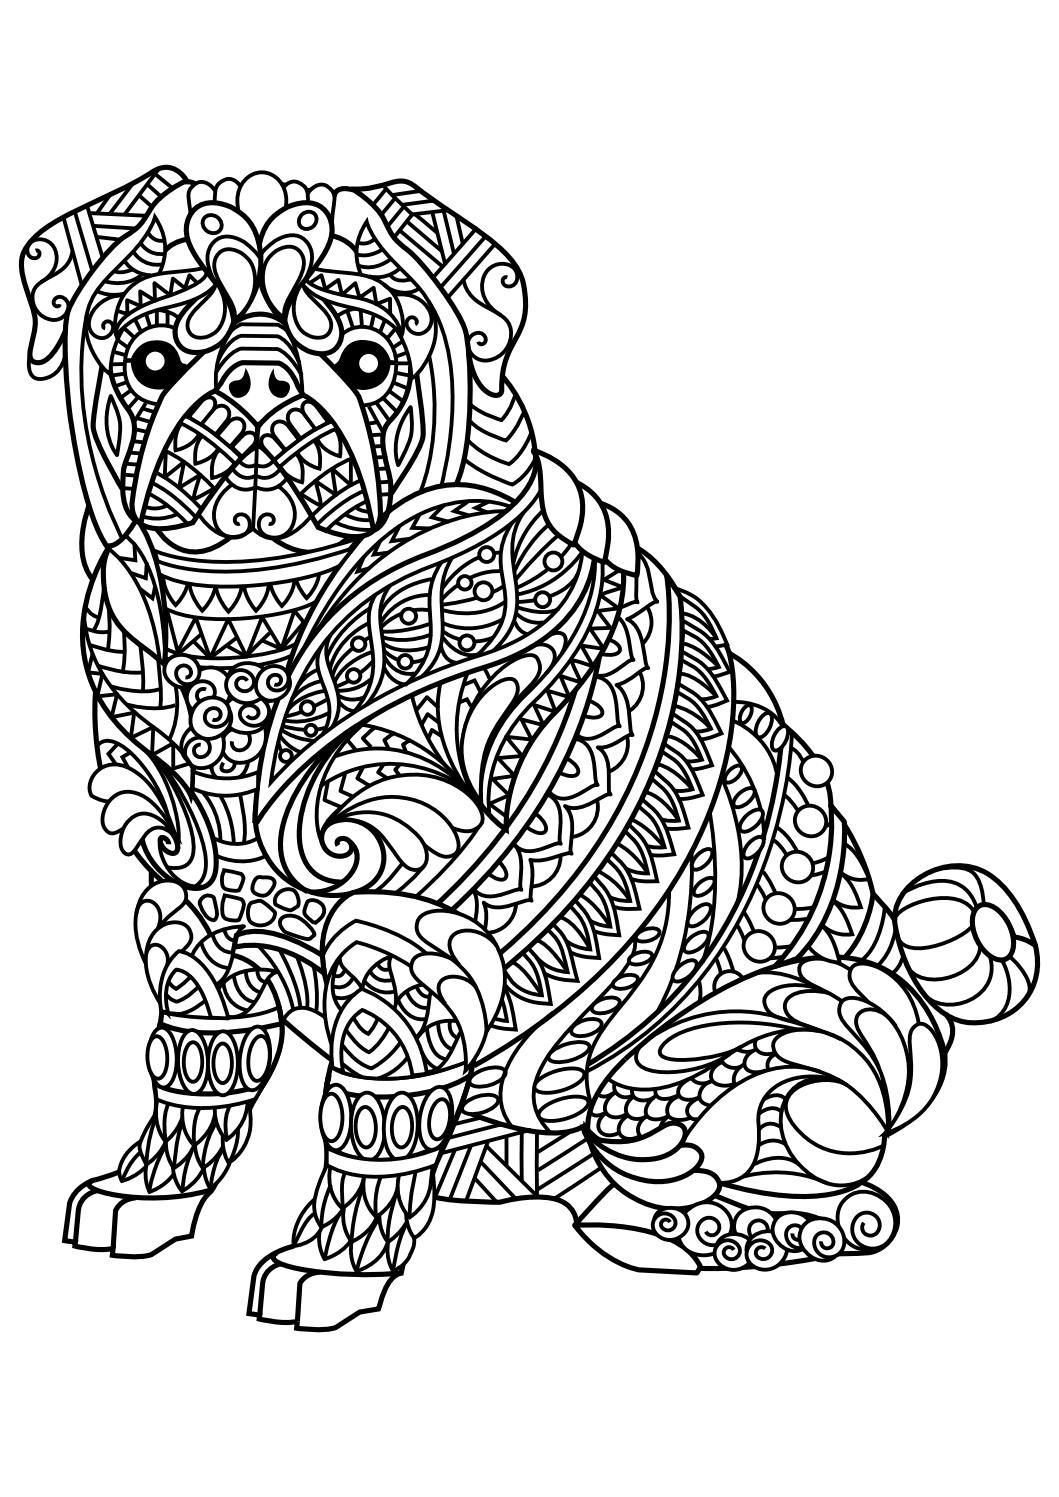 1059x1497 English Bulldog Adult Coloring Pages Download Coloring Sheets